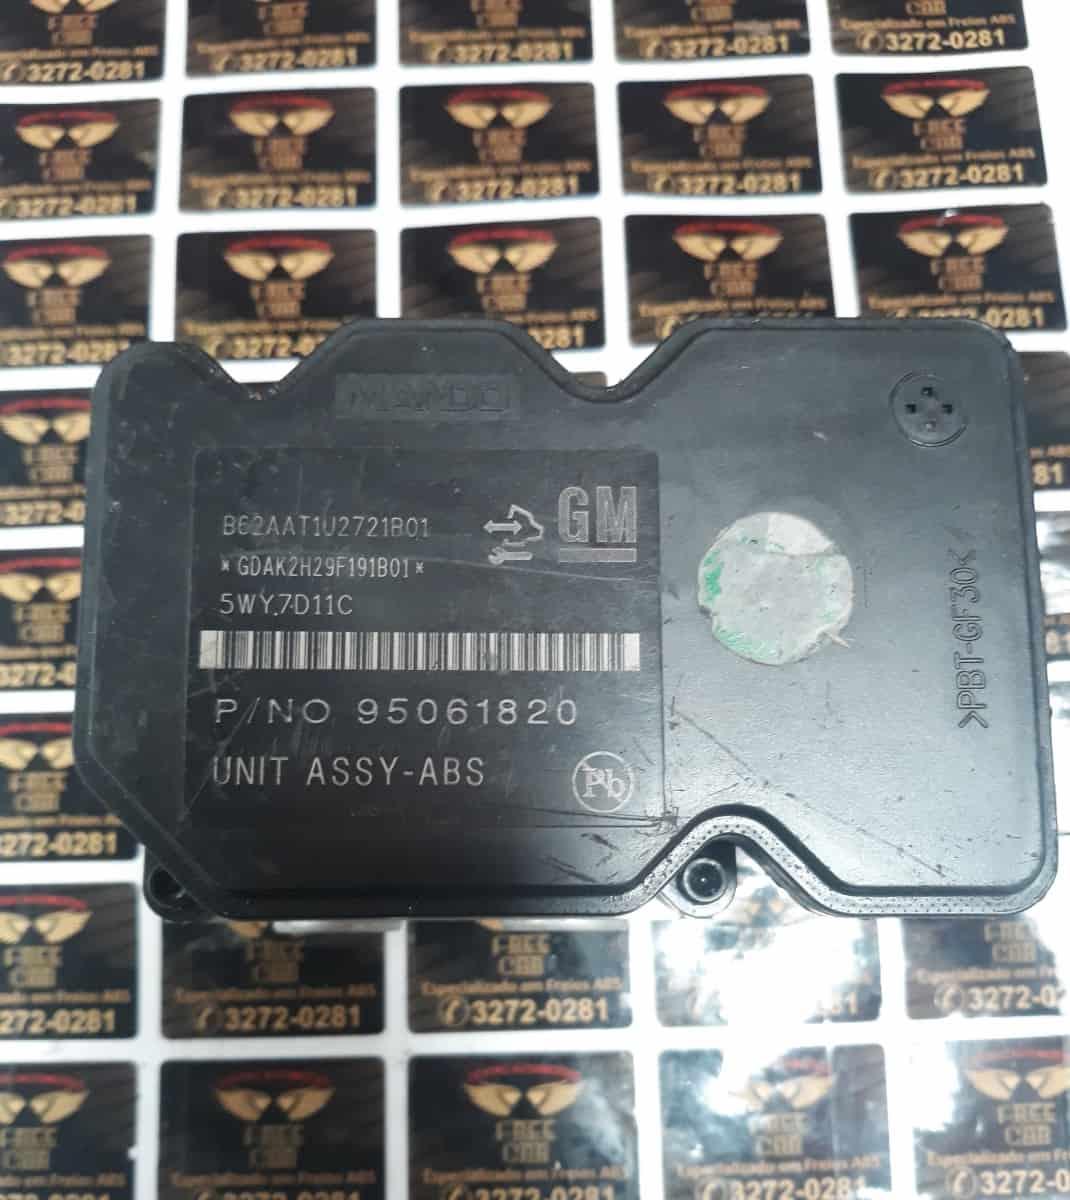 Modulo ABS Chevrolet 95061820 - Foto 1